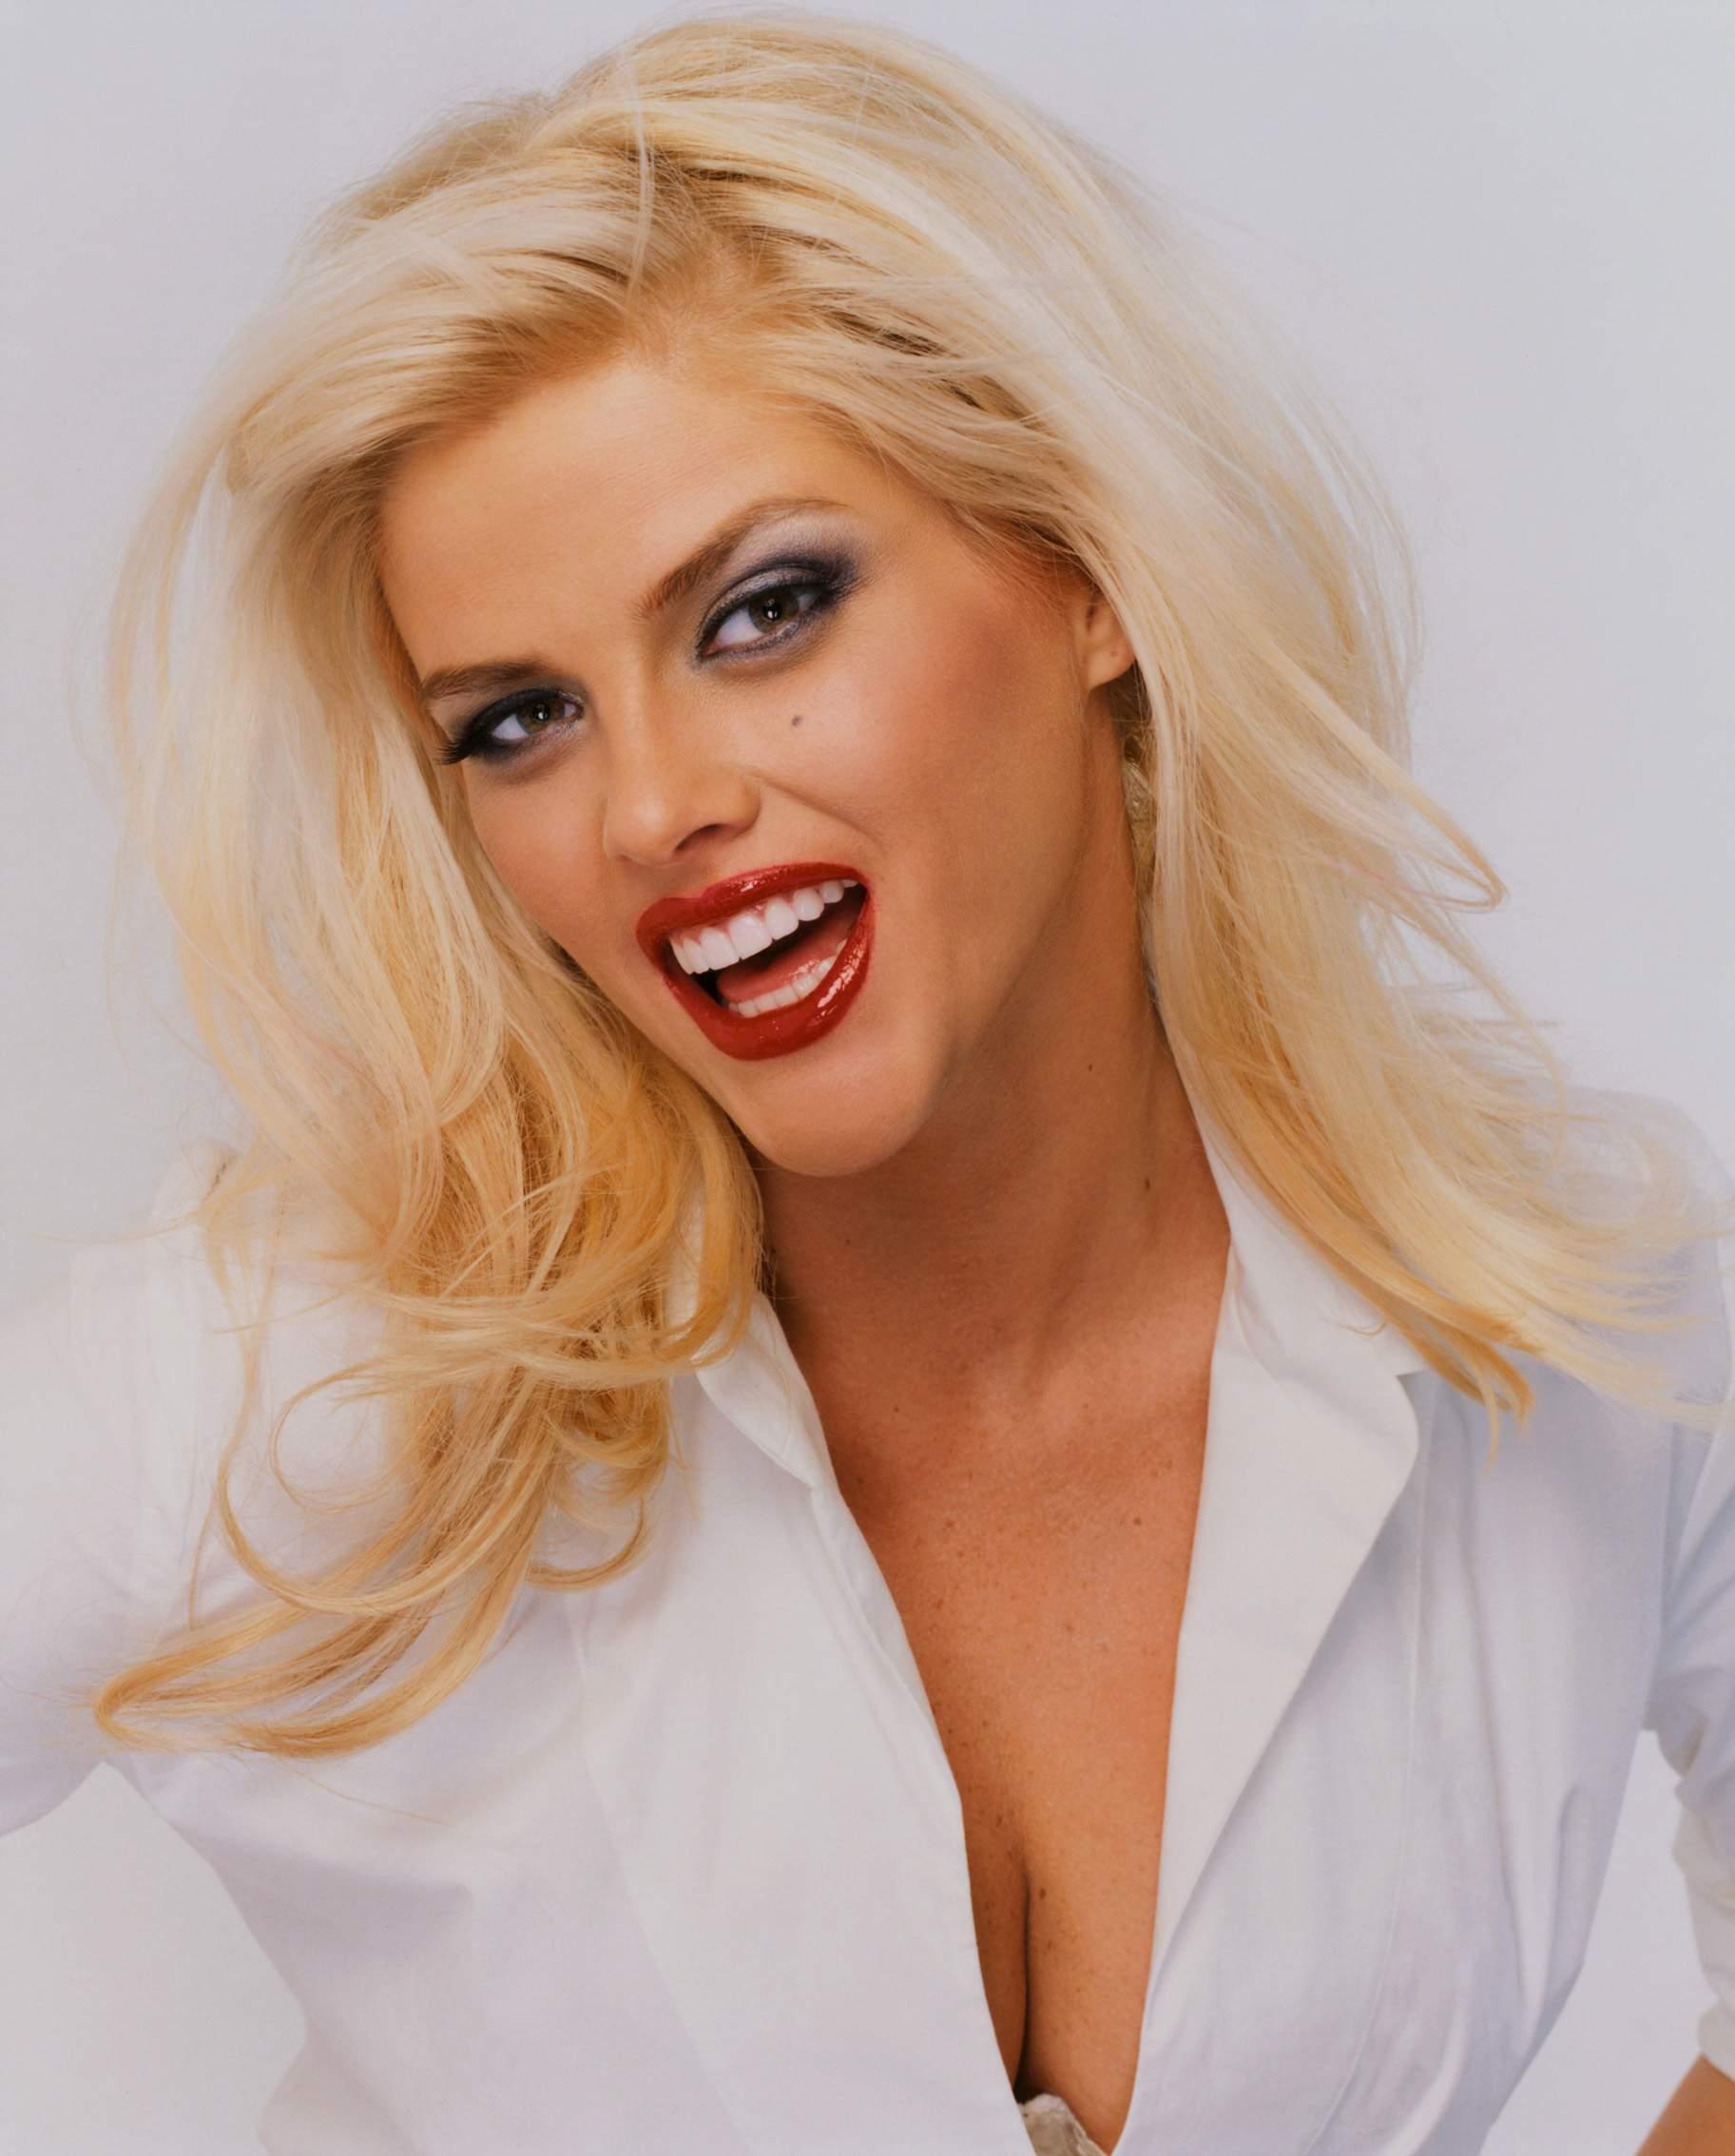 Anna Nicole Smith Photo 31 Of 54 Pics Wallpaper Photo